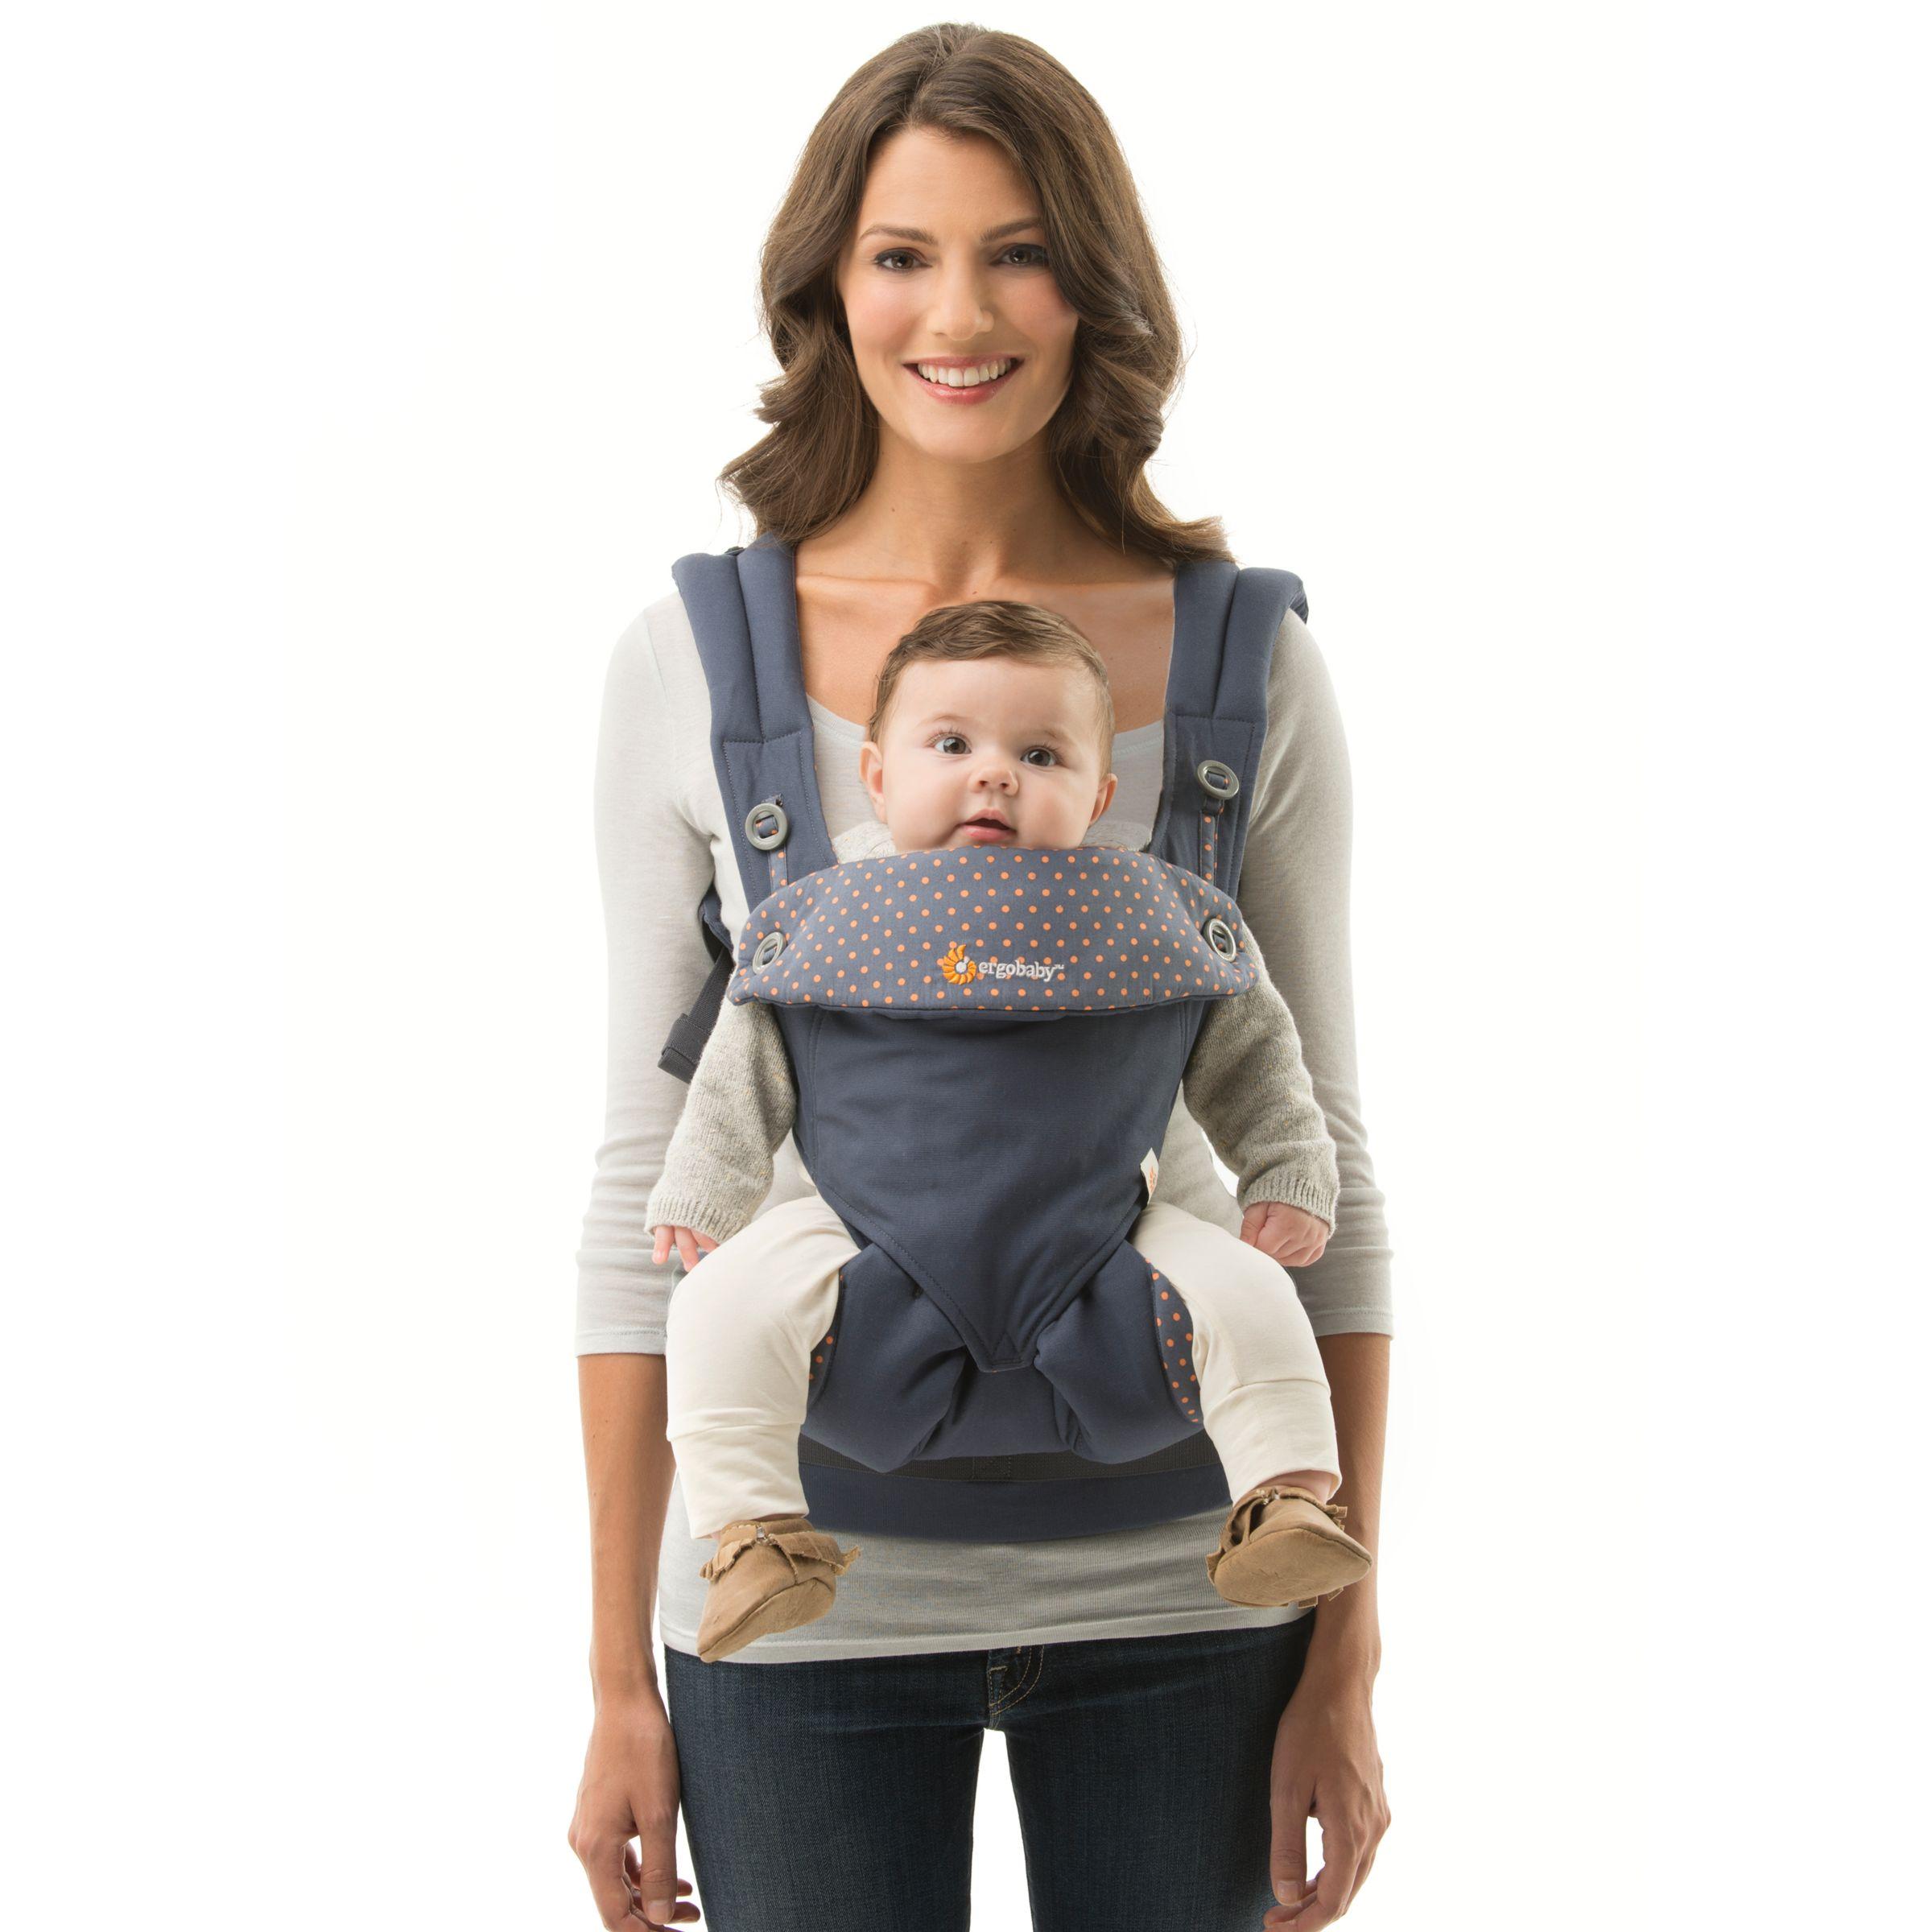 ergo baby carrier online